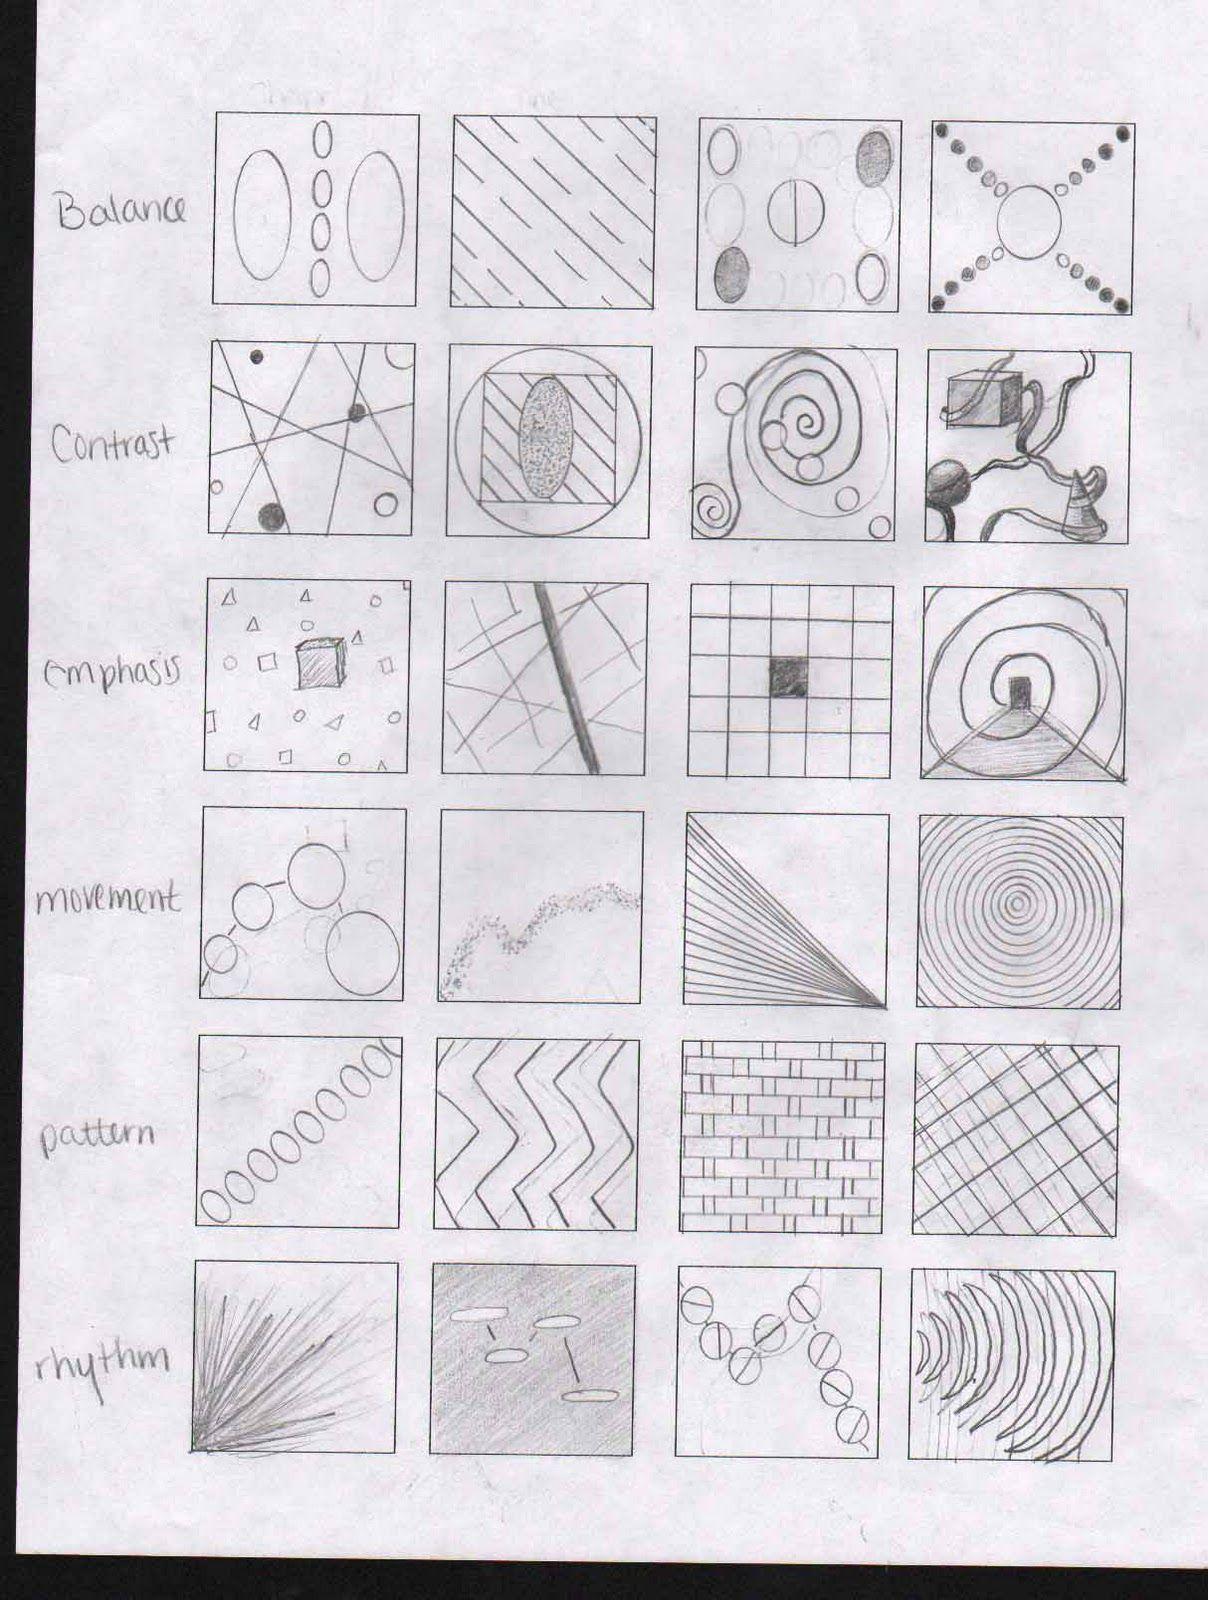 Principles Of Design Principles Of Design Art Worksheets Art Basics